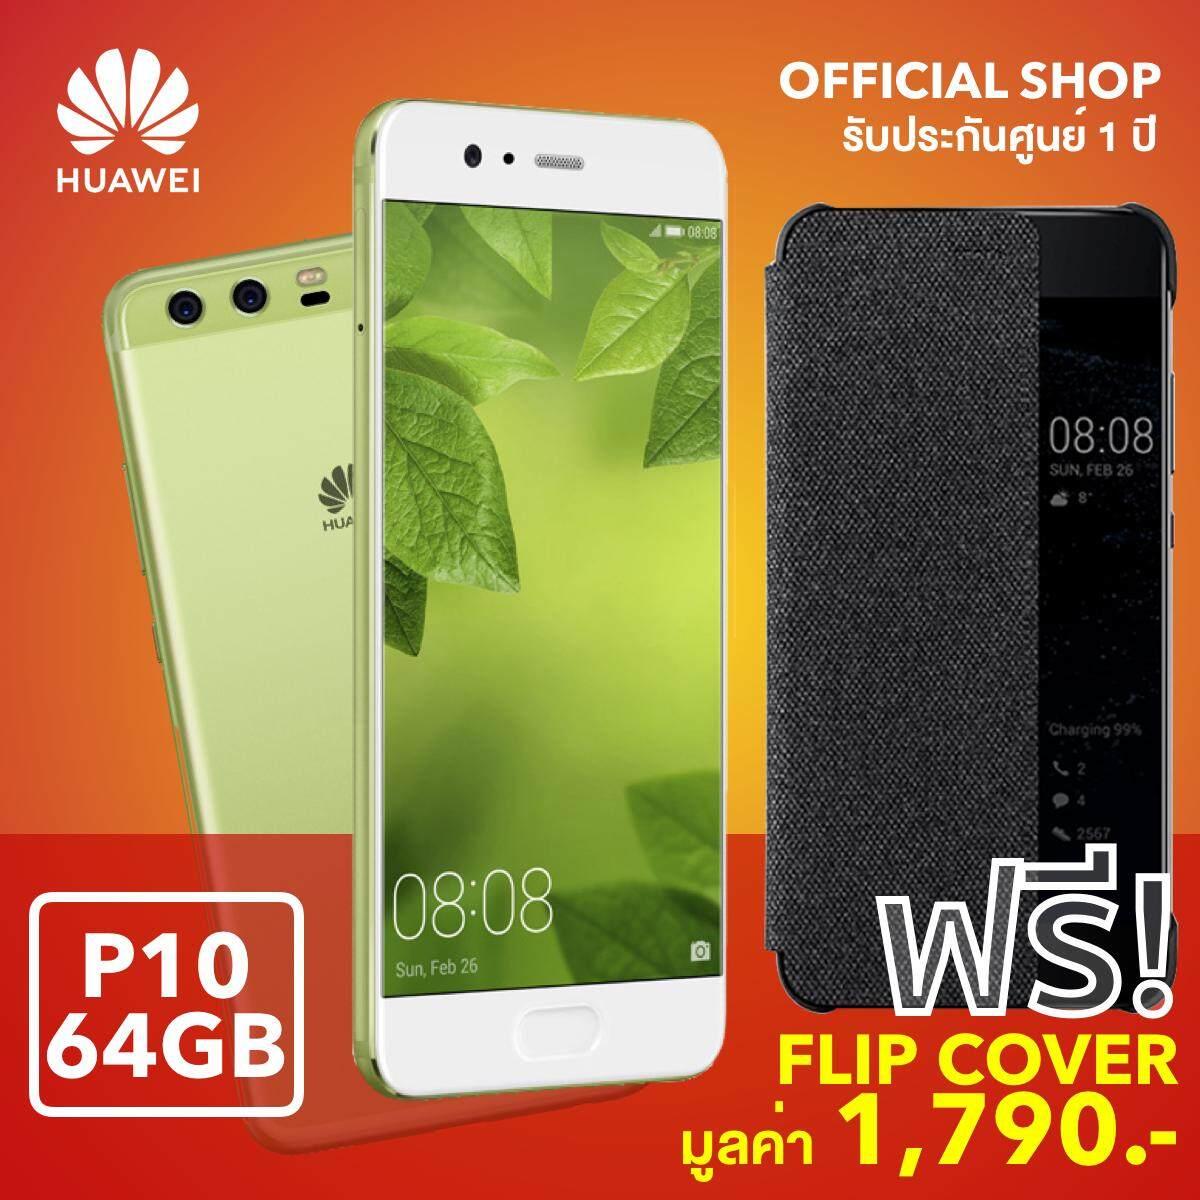 Huawei P10 64GB Greenery ***พิเศษ!! รับฟรี TPU Case Flip cover มูลค่า 1,790 บาท***